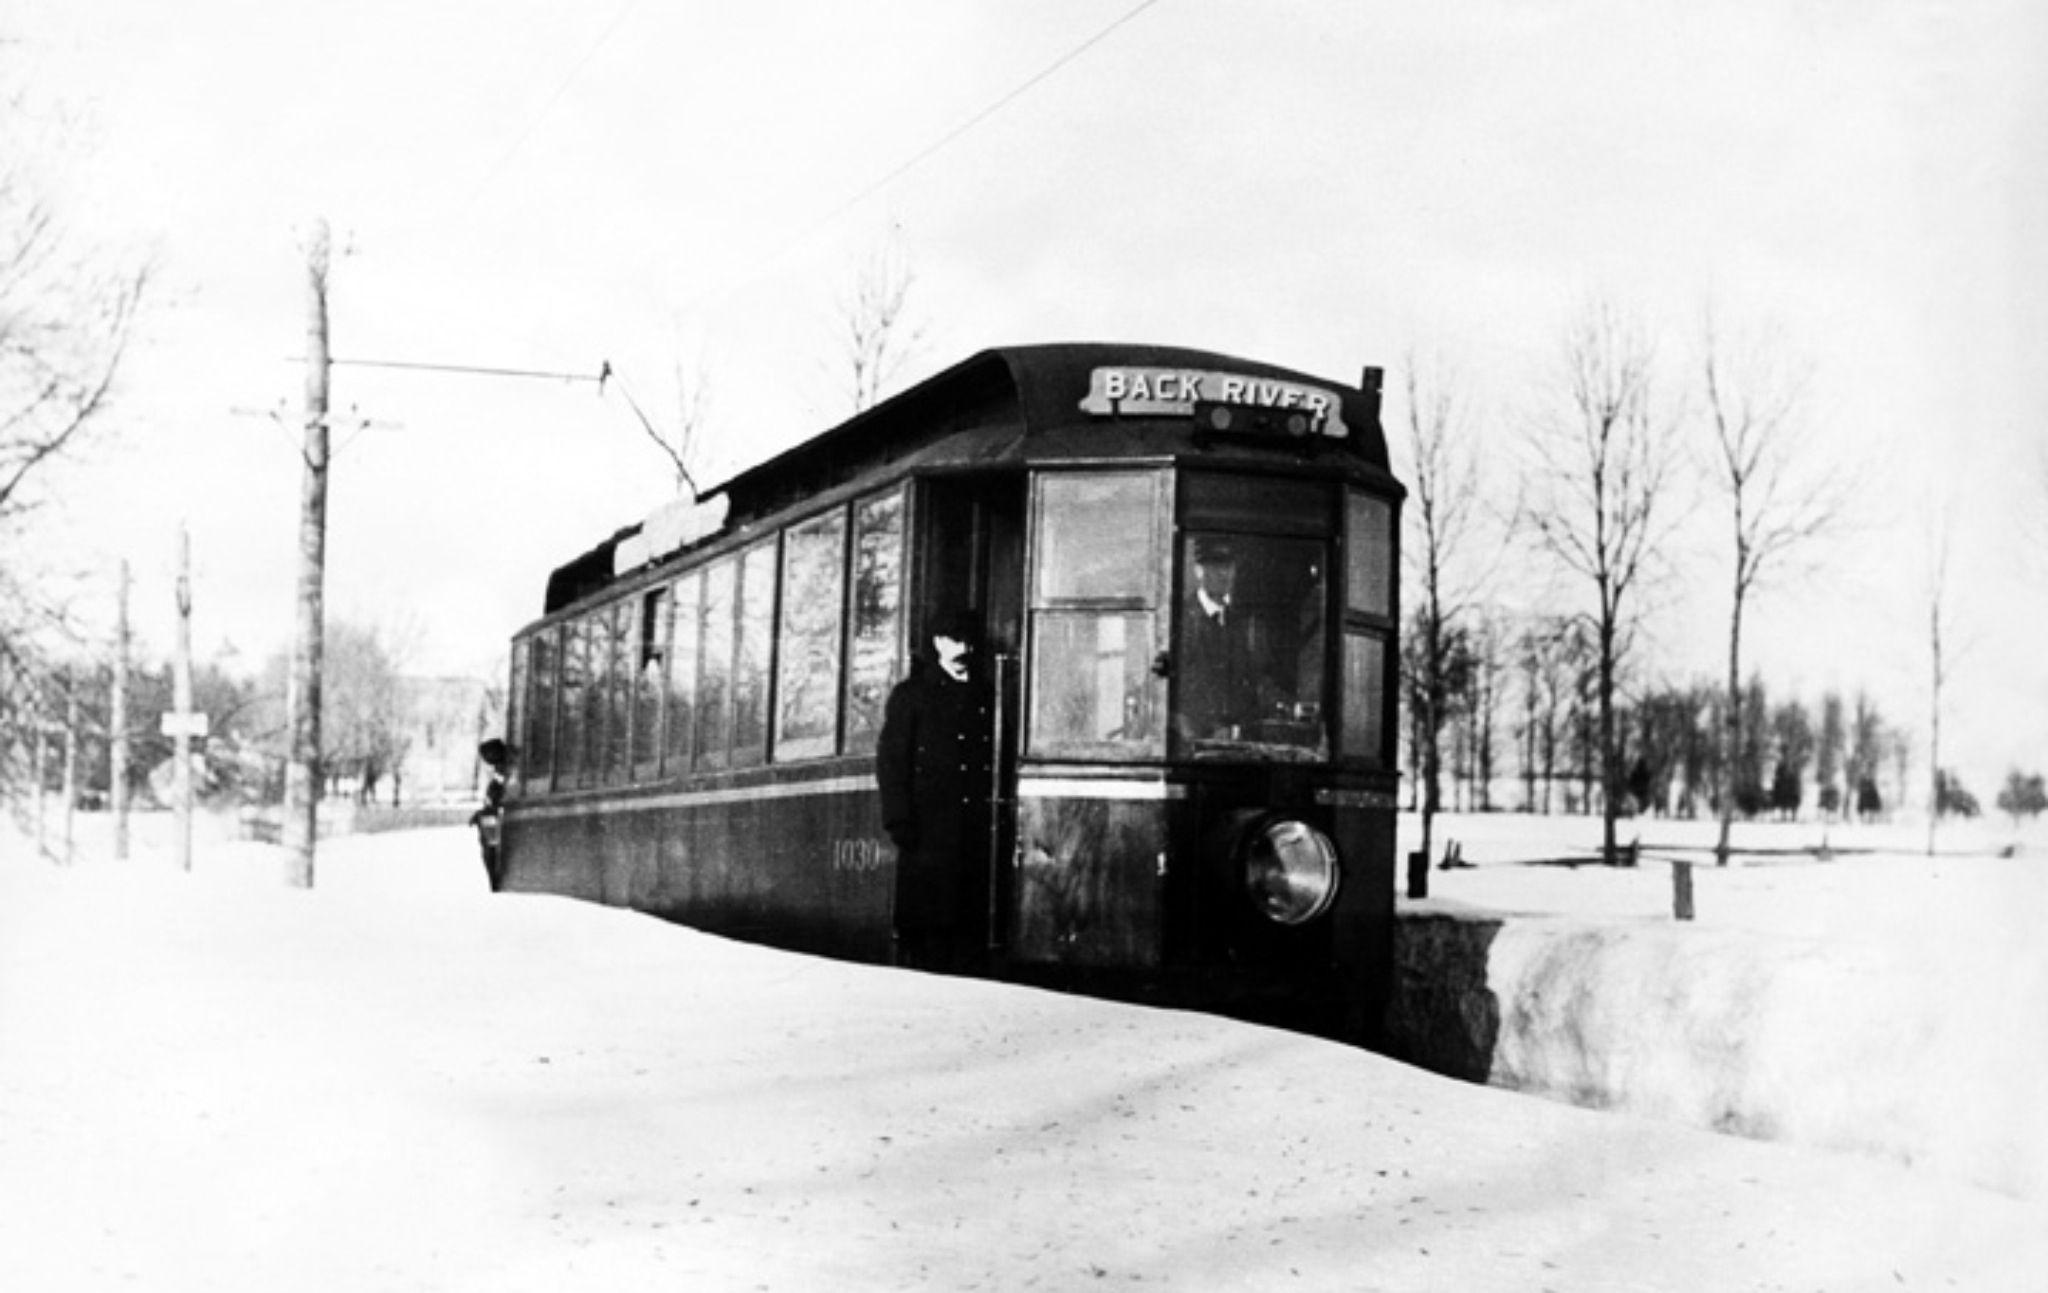 Tramway Back River Ahuntsic Quebec Montreal History